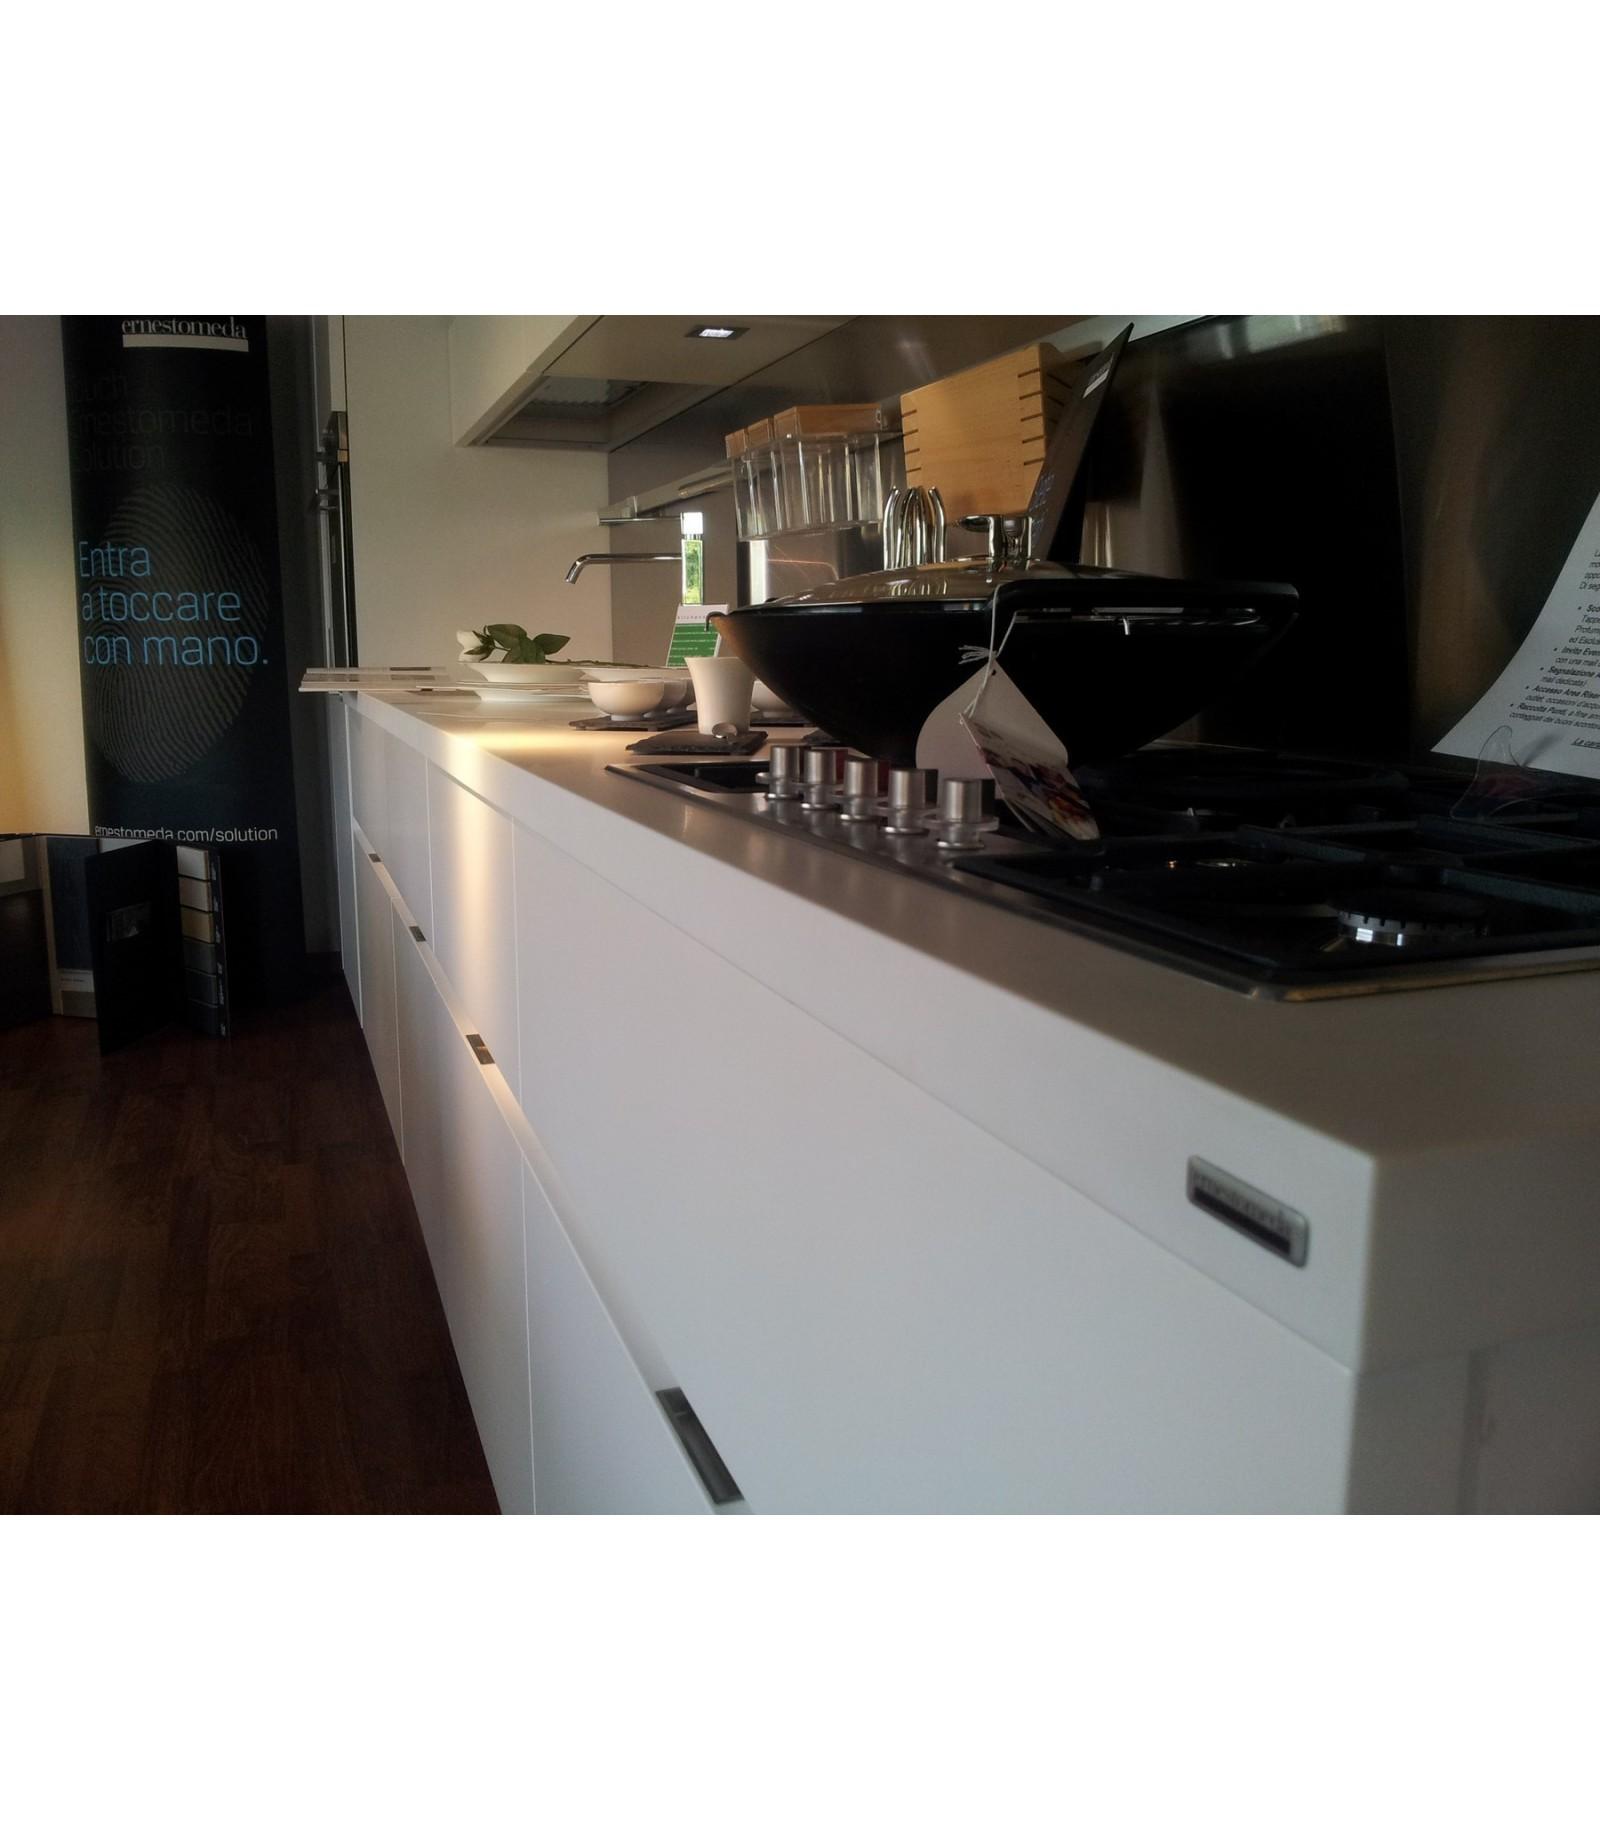 Best cucine ernestomeda outlet gallery acrylicgiftware - Divani lago opinioni ...